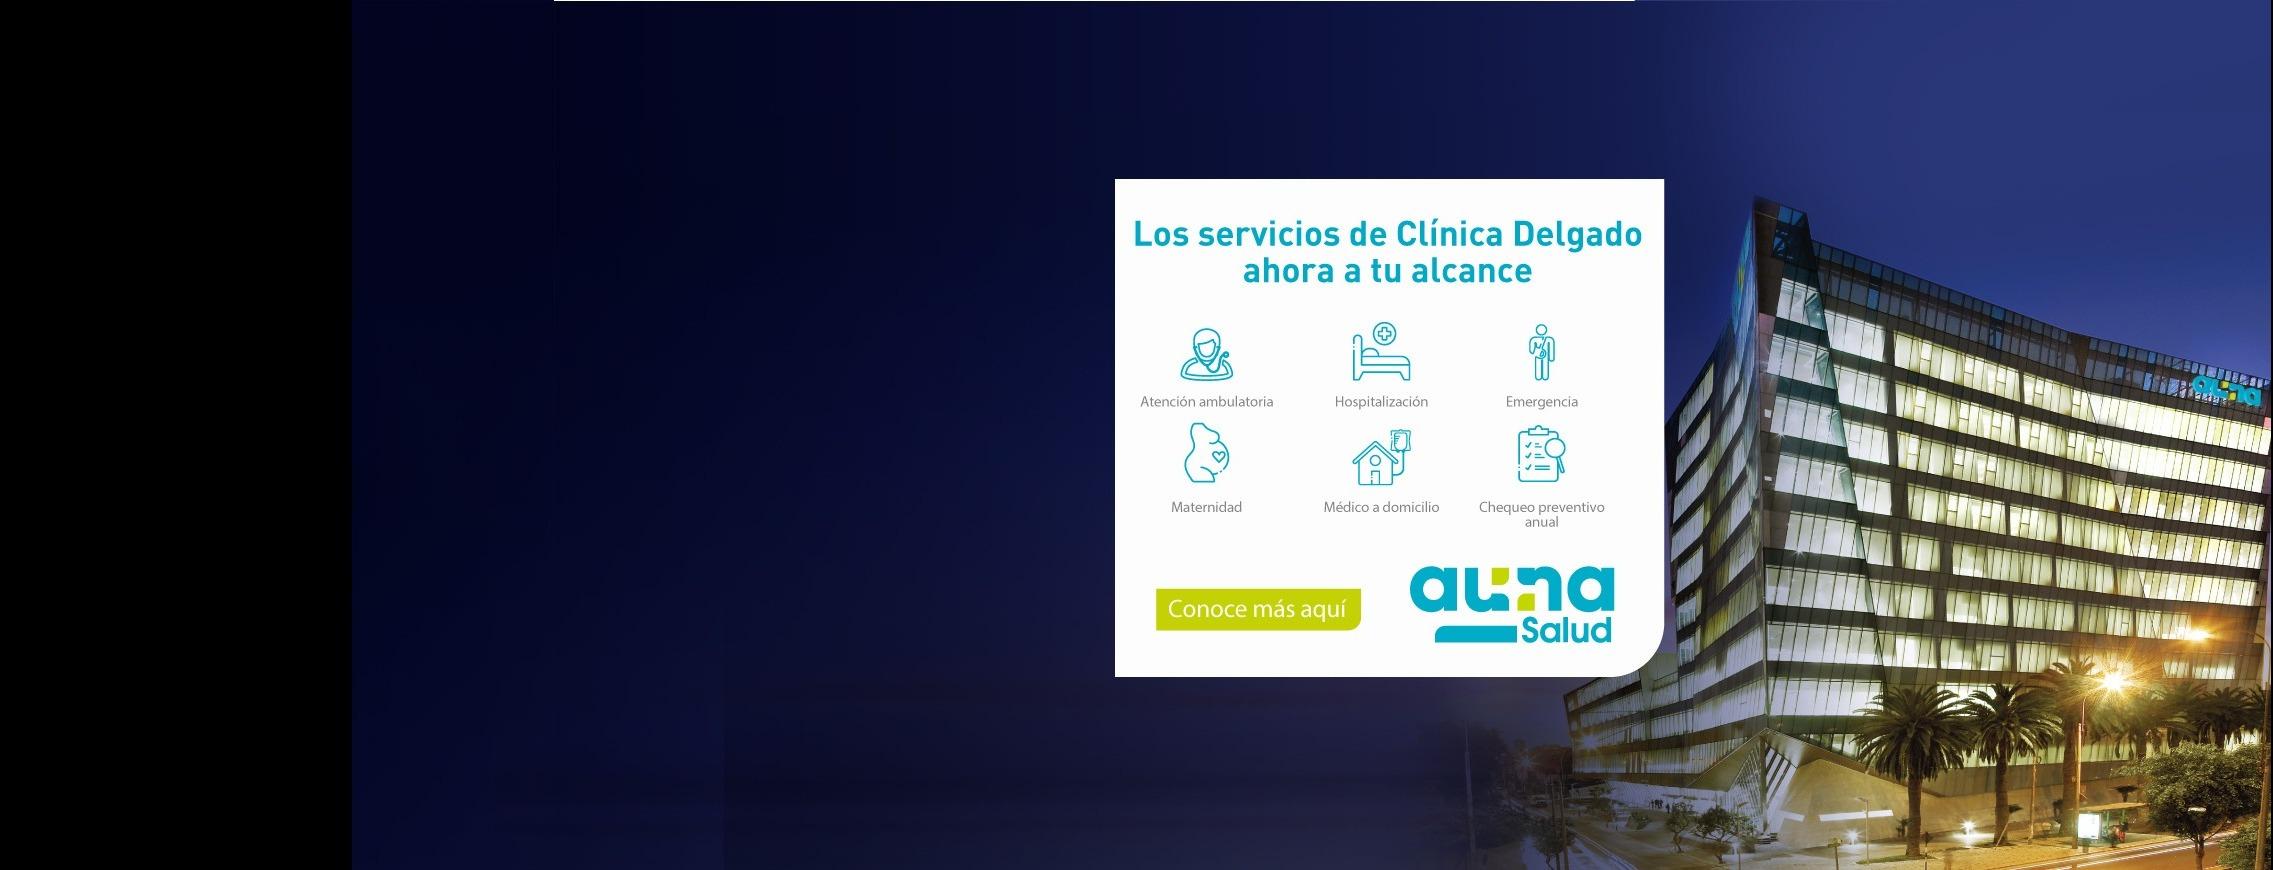 Slider_Auna_Salud-1